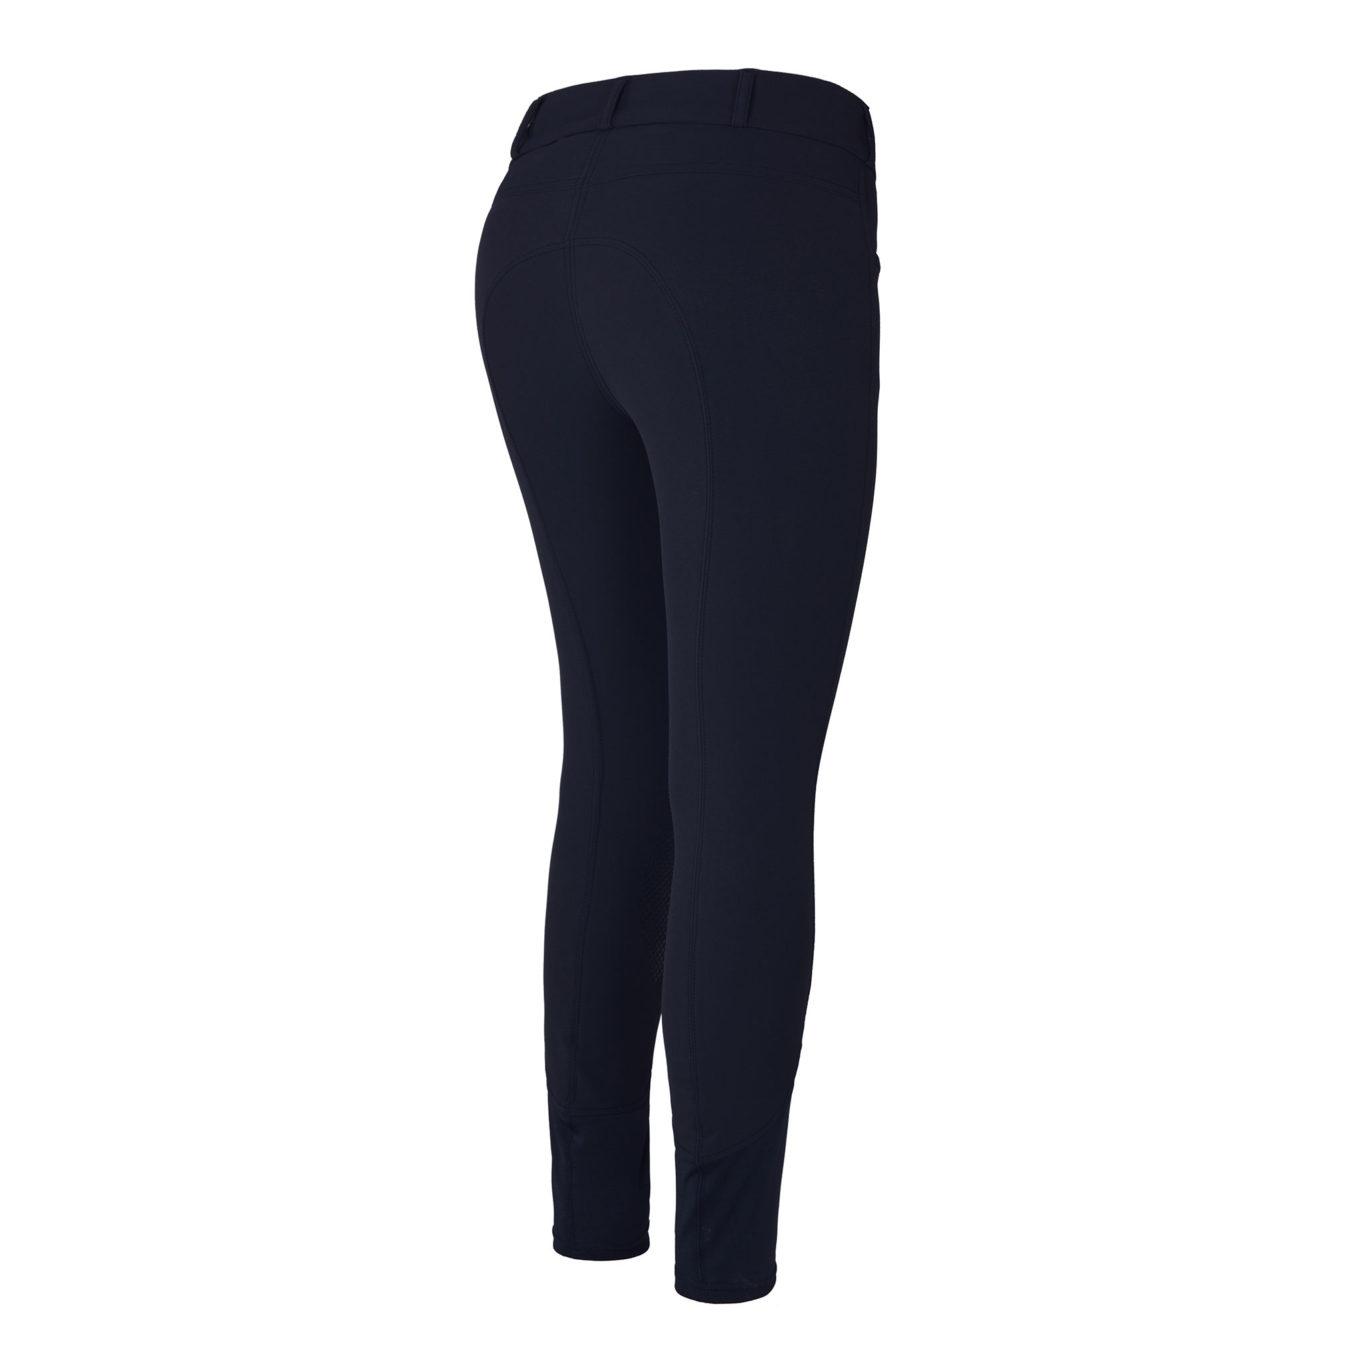 Pantalones Con Grip En Las Rodillas Color Azul Marino Para Mujer Modelo Kadi De Kingsland Alogo